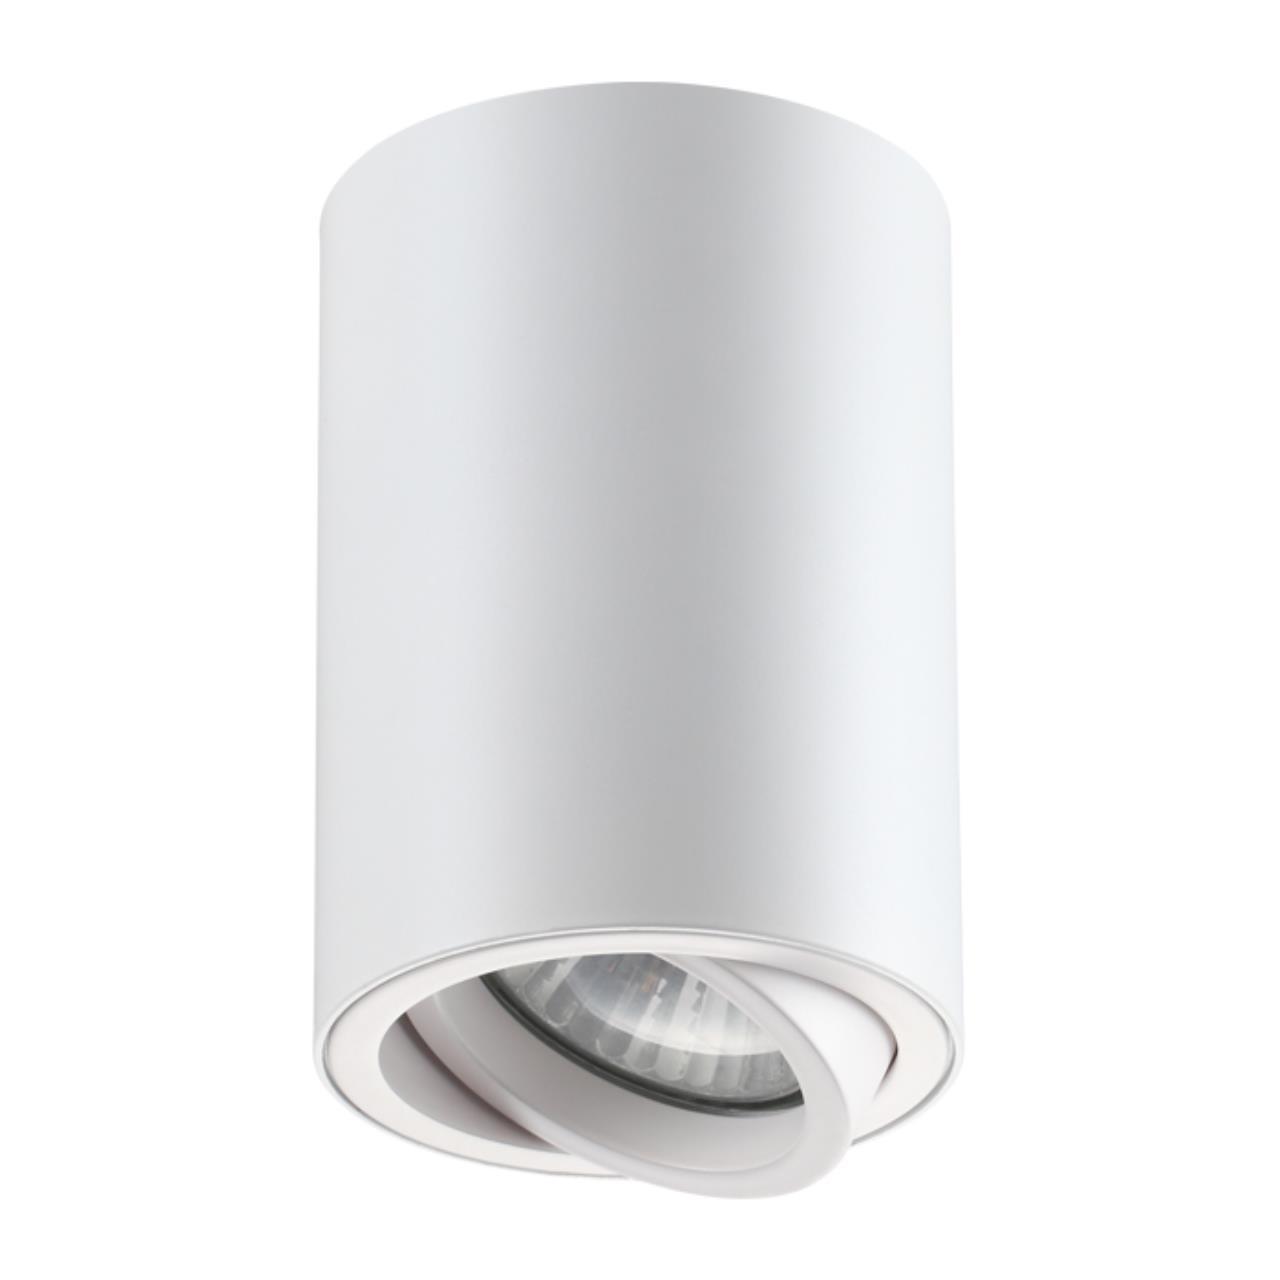 370397 OVER NT18 101 белый Накладной светильник IP20 GU10 50W 220V PIPE